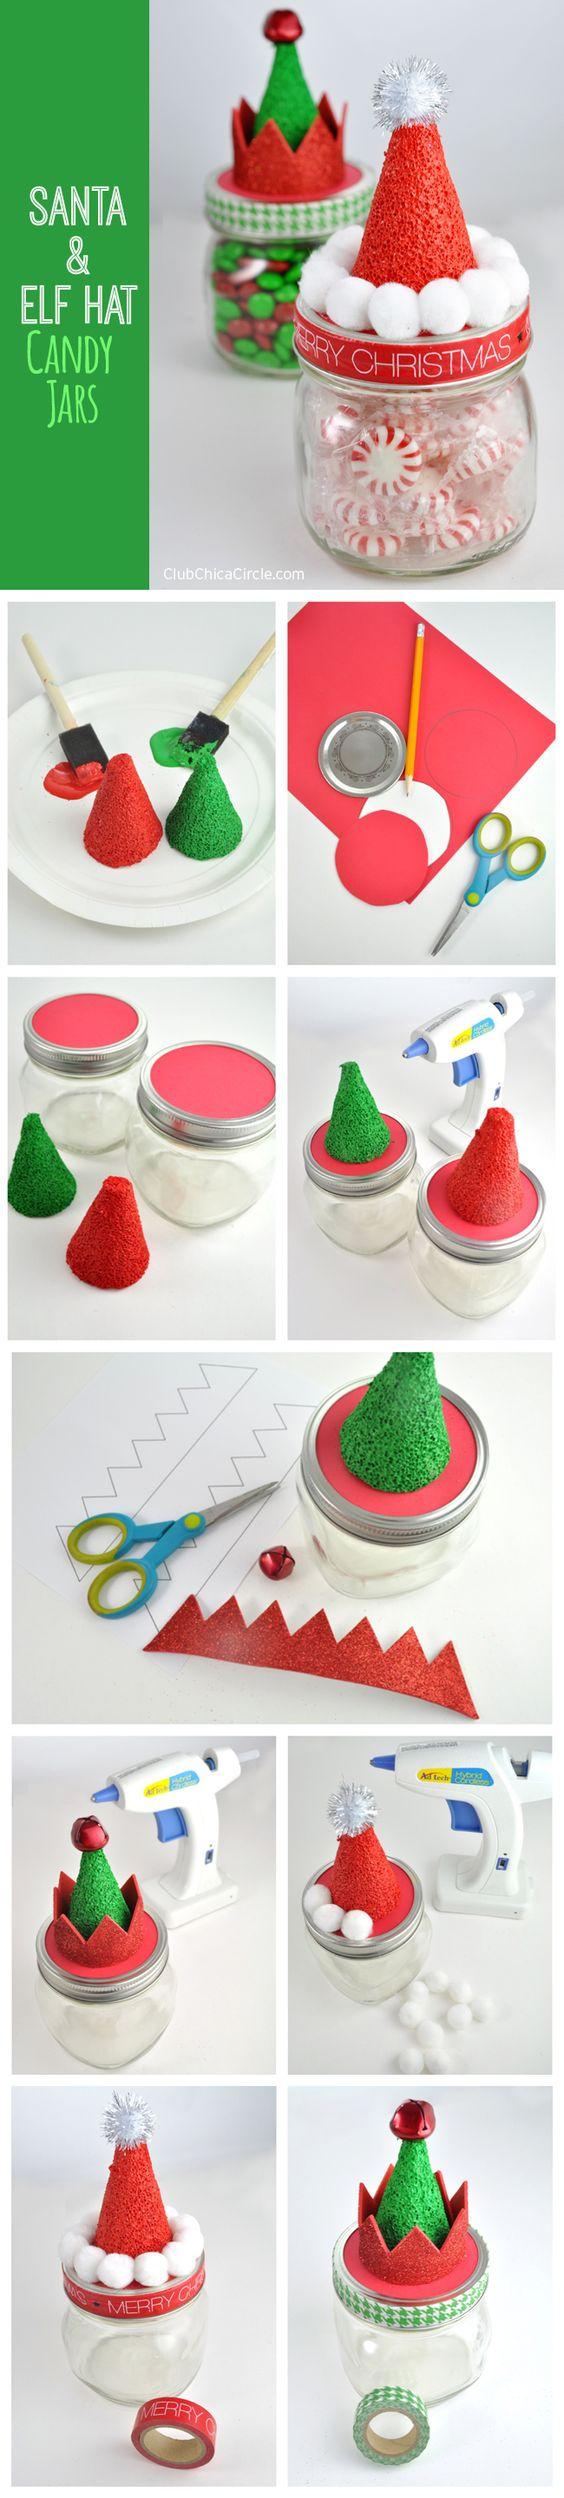 How to Make Santa and Elf Hat Candy Mason Jars #makeitfuncrafts: